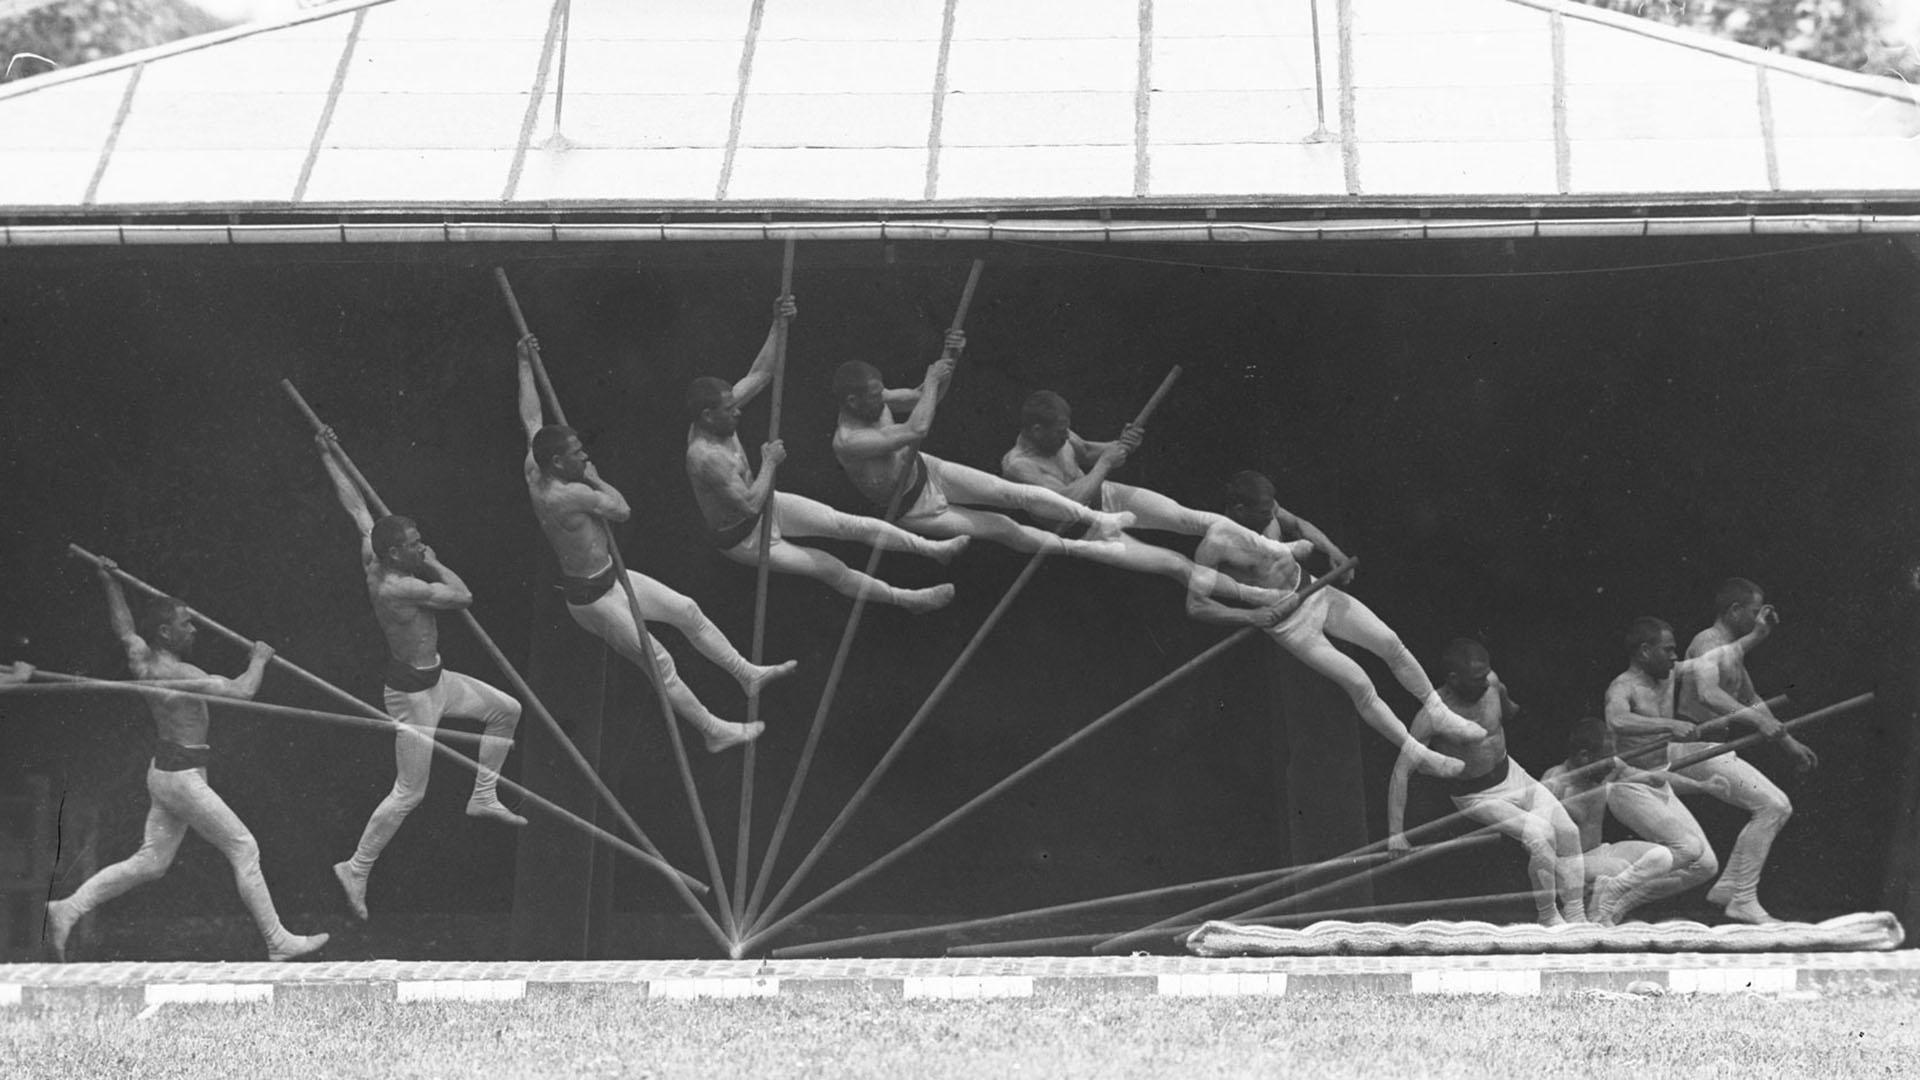 Locomoção humana IIIB, cronofotografia, 1886. ©️ Étienne-Jules Marey/ Collège de France.